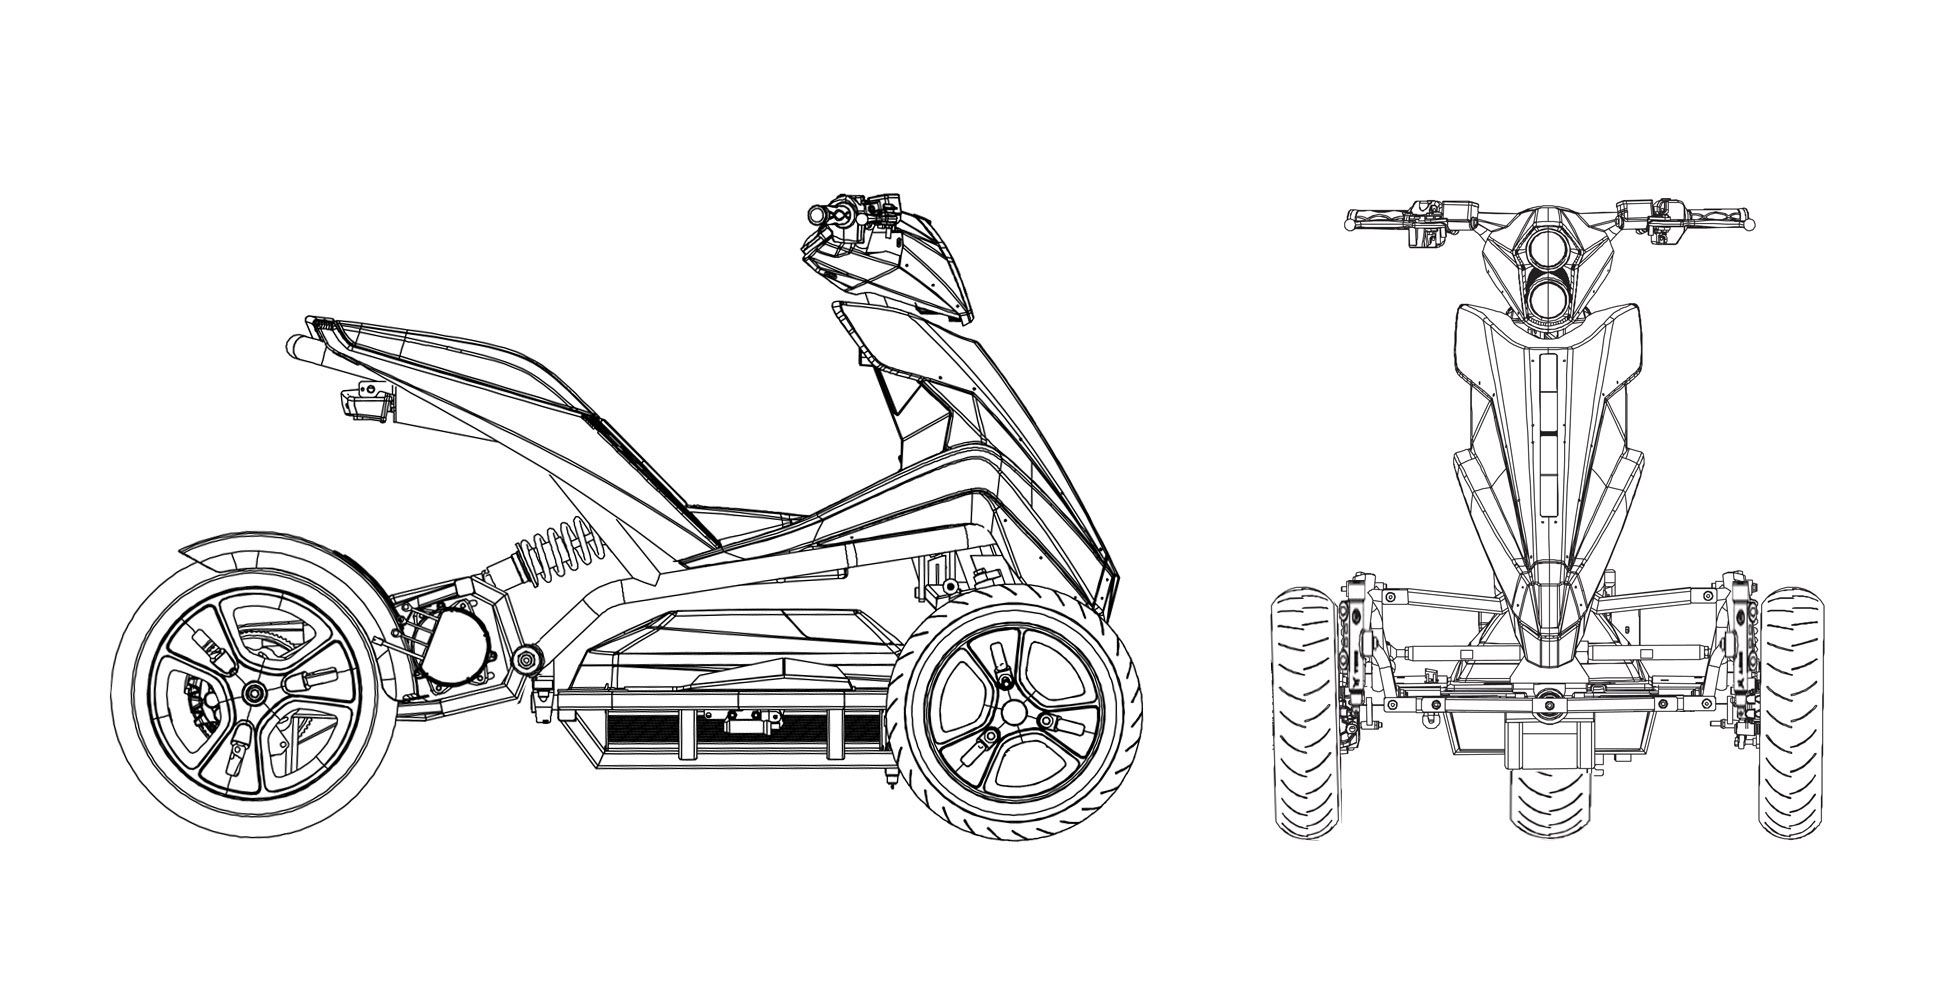 Displey Electro Van Raam Tricycle Cars And Motorcycles T